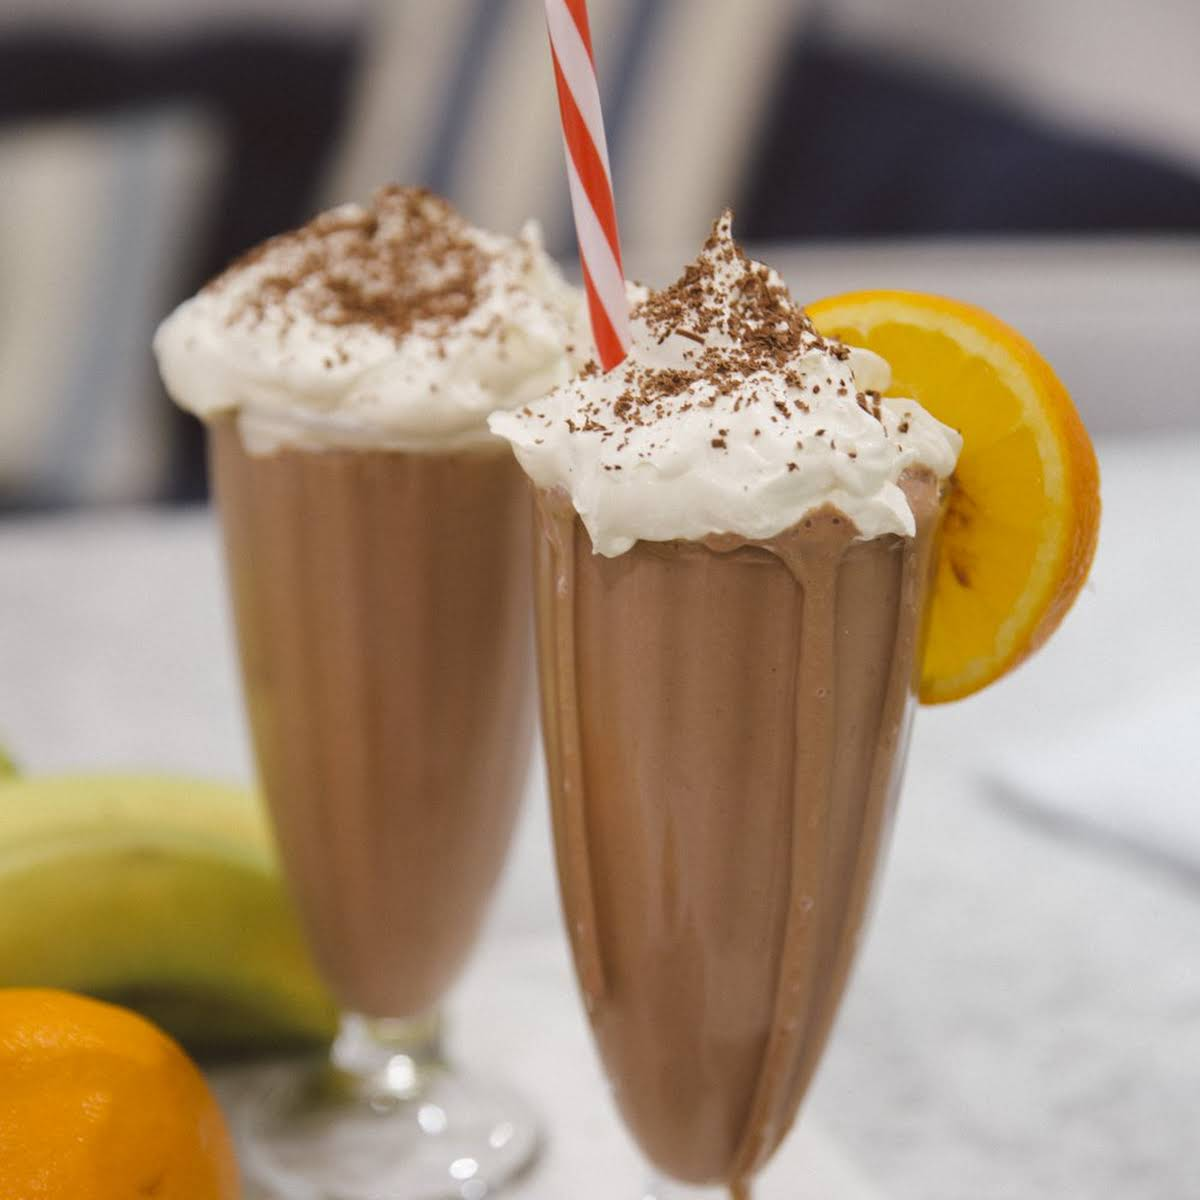 Chocolate Orange Smoothie